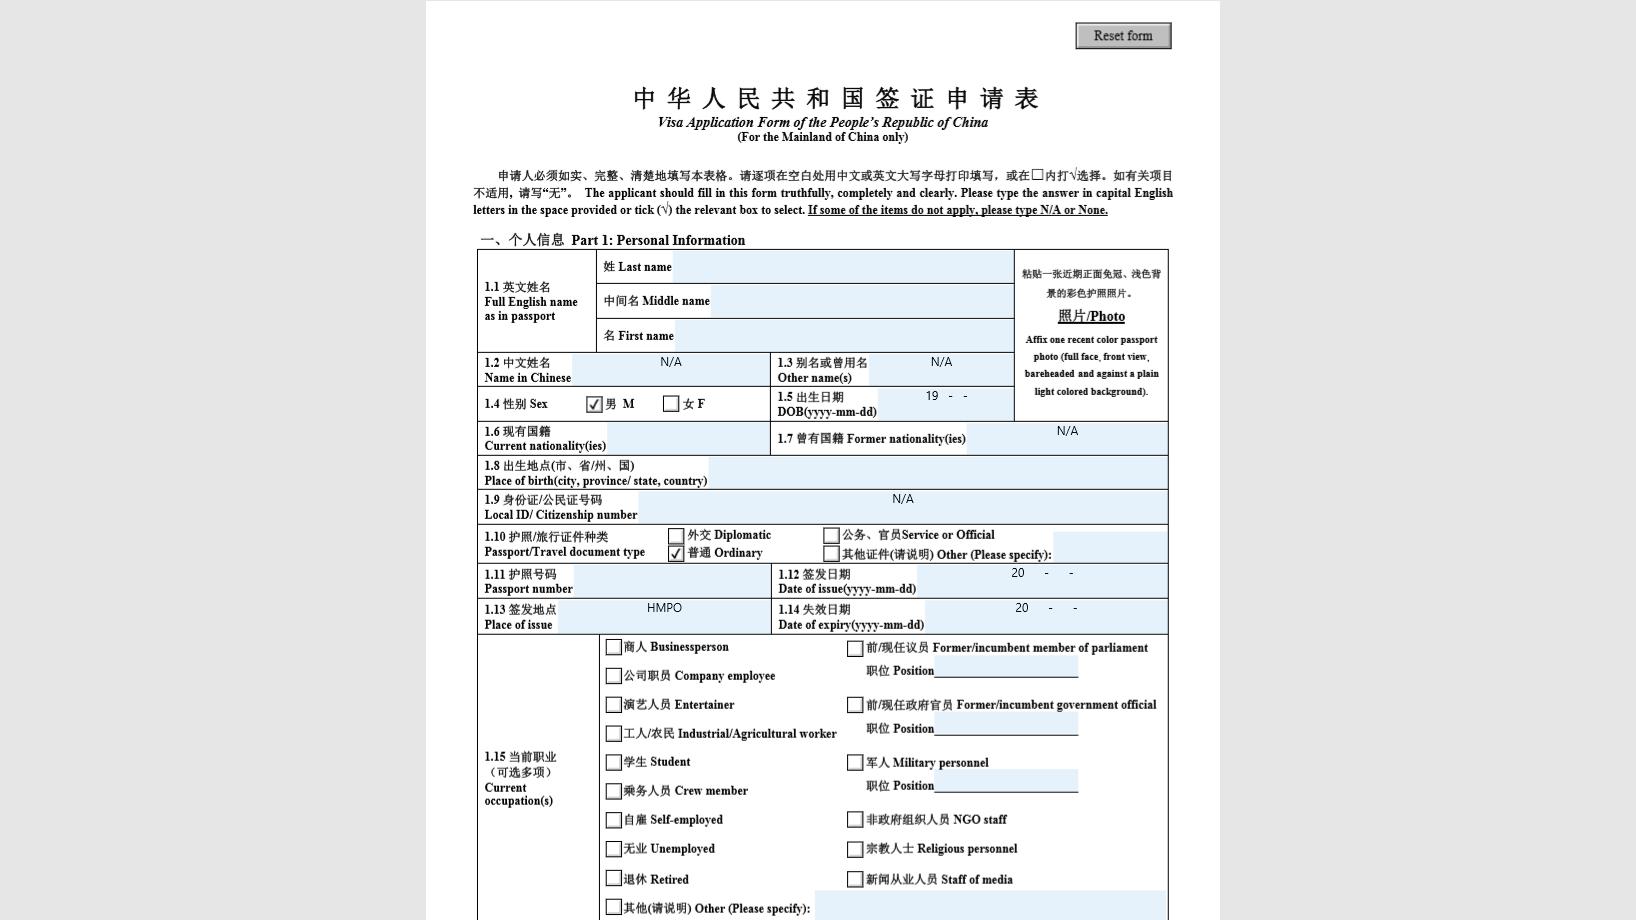 New Online Chinese Visa Form (Version 2019).